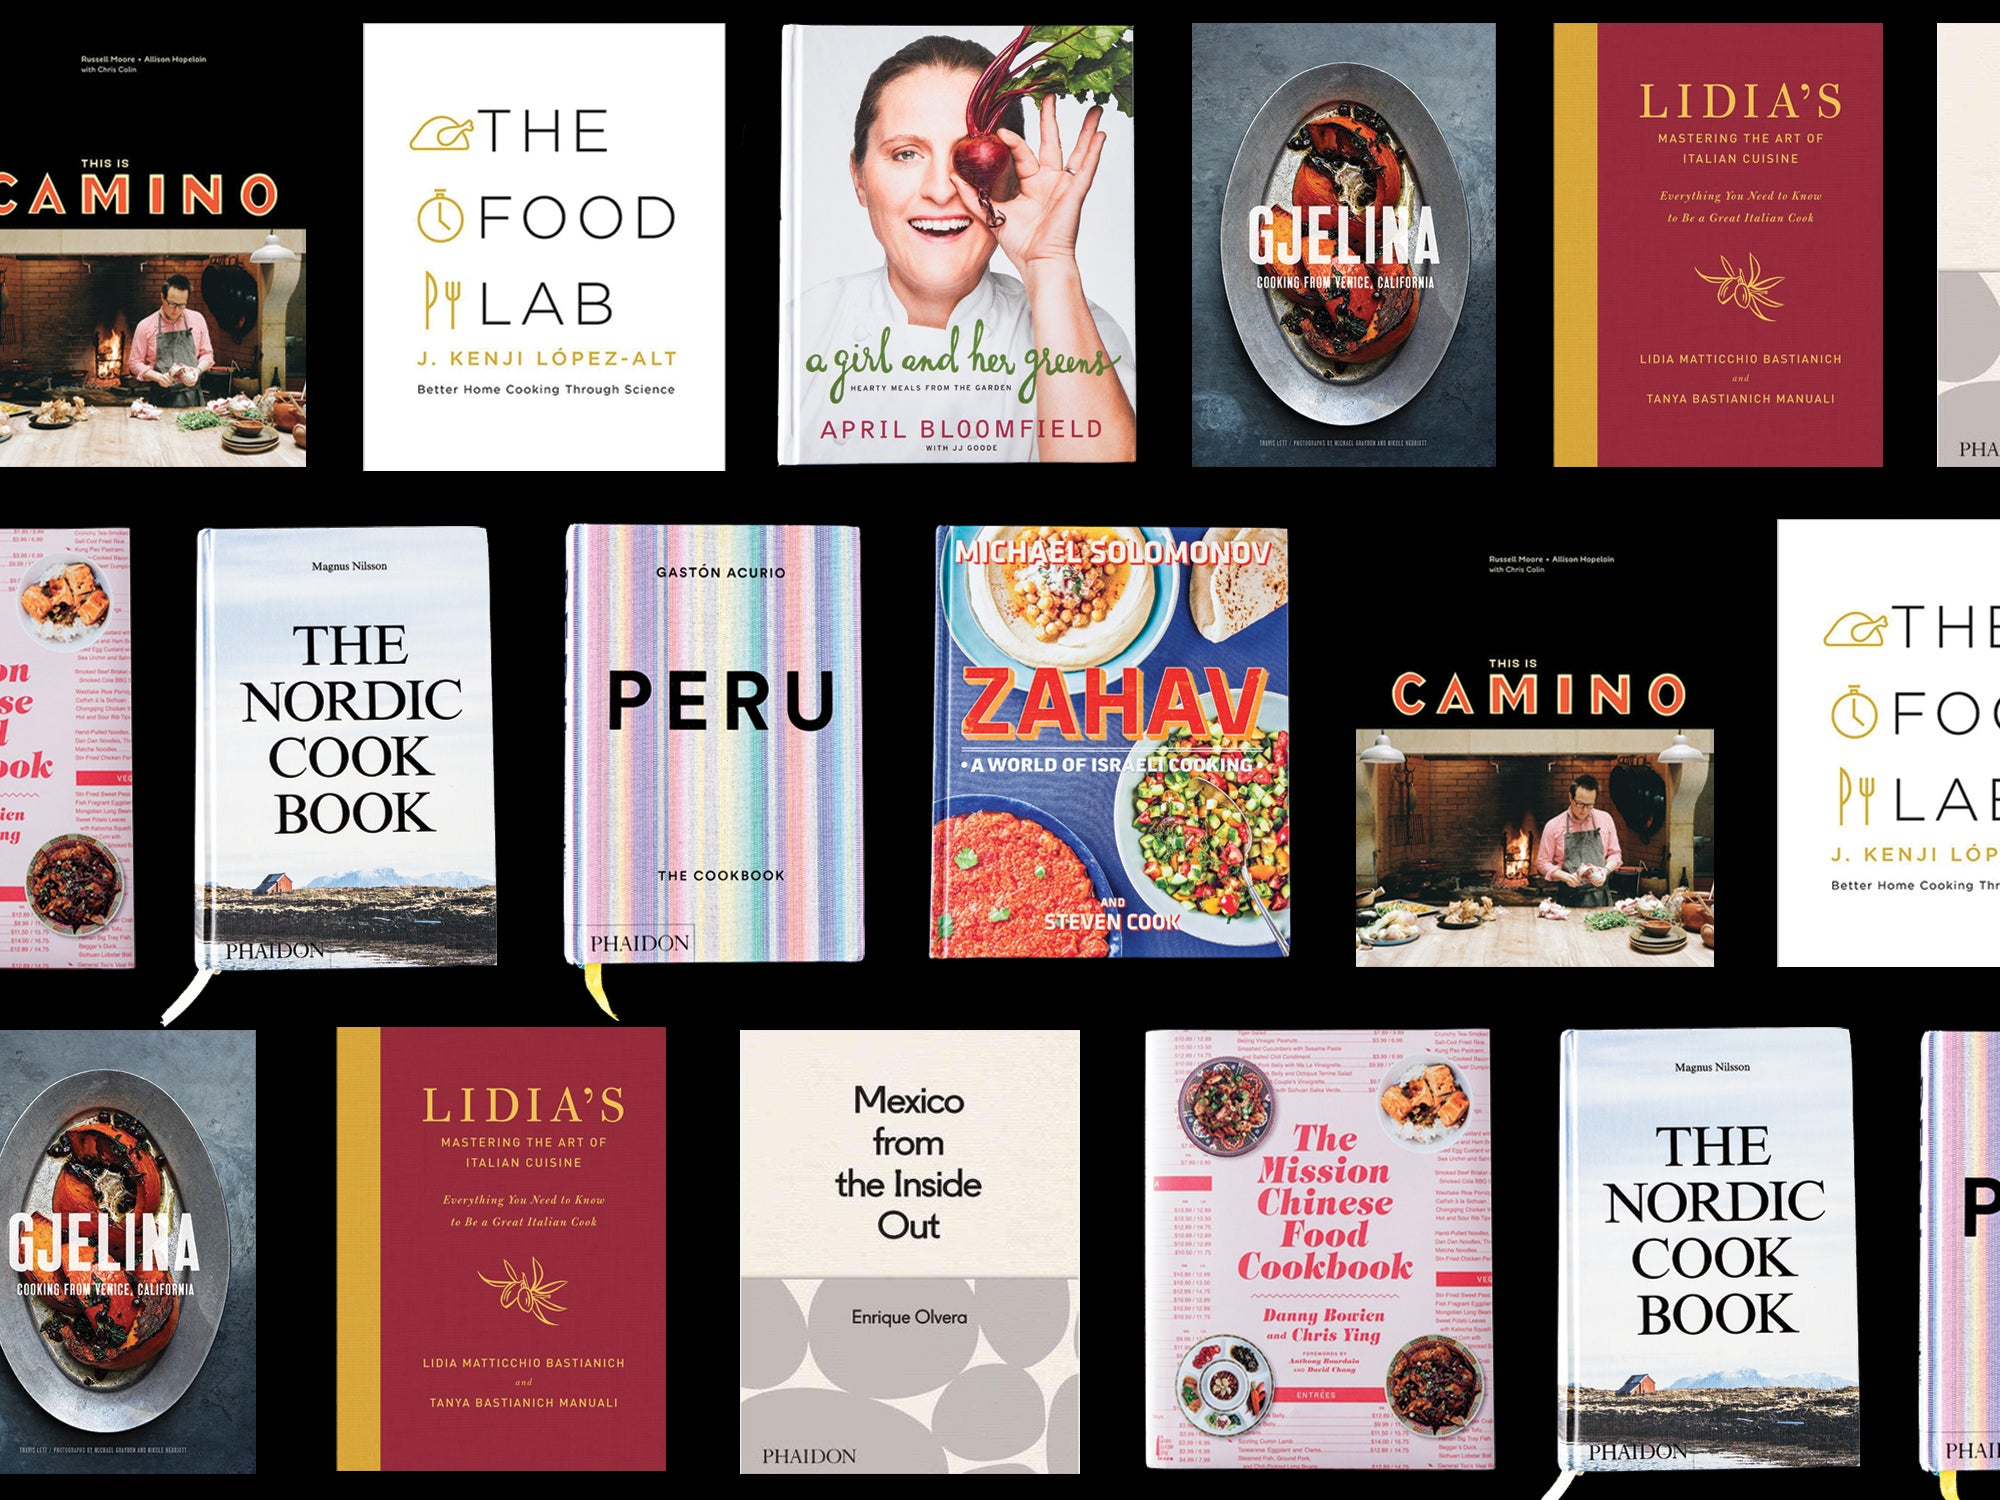 Saveur 100 2016 Top Cookbooks